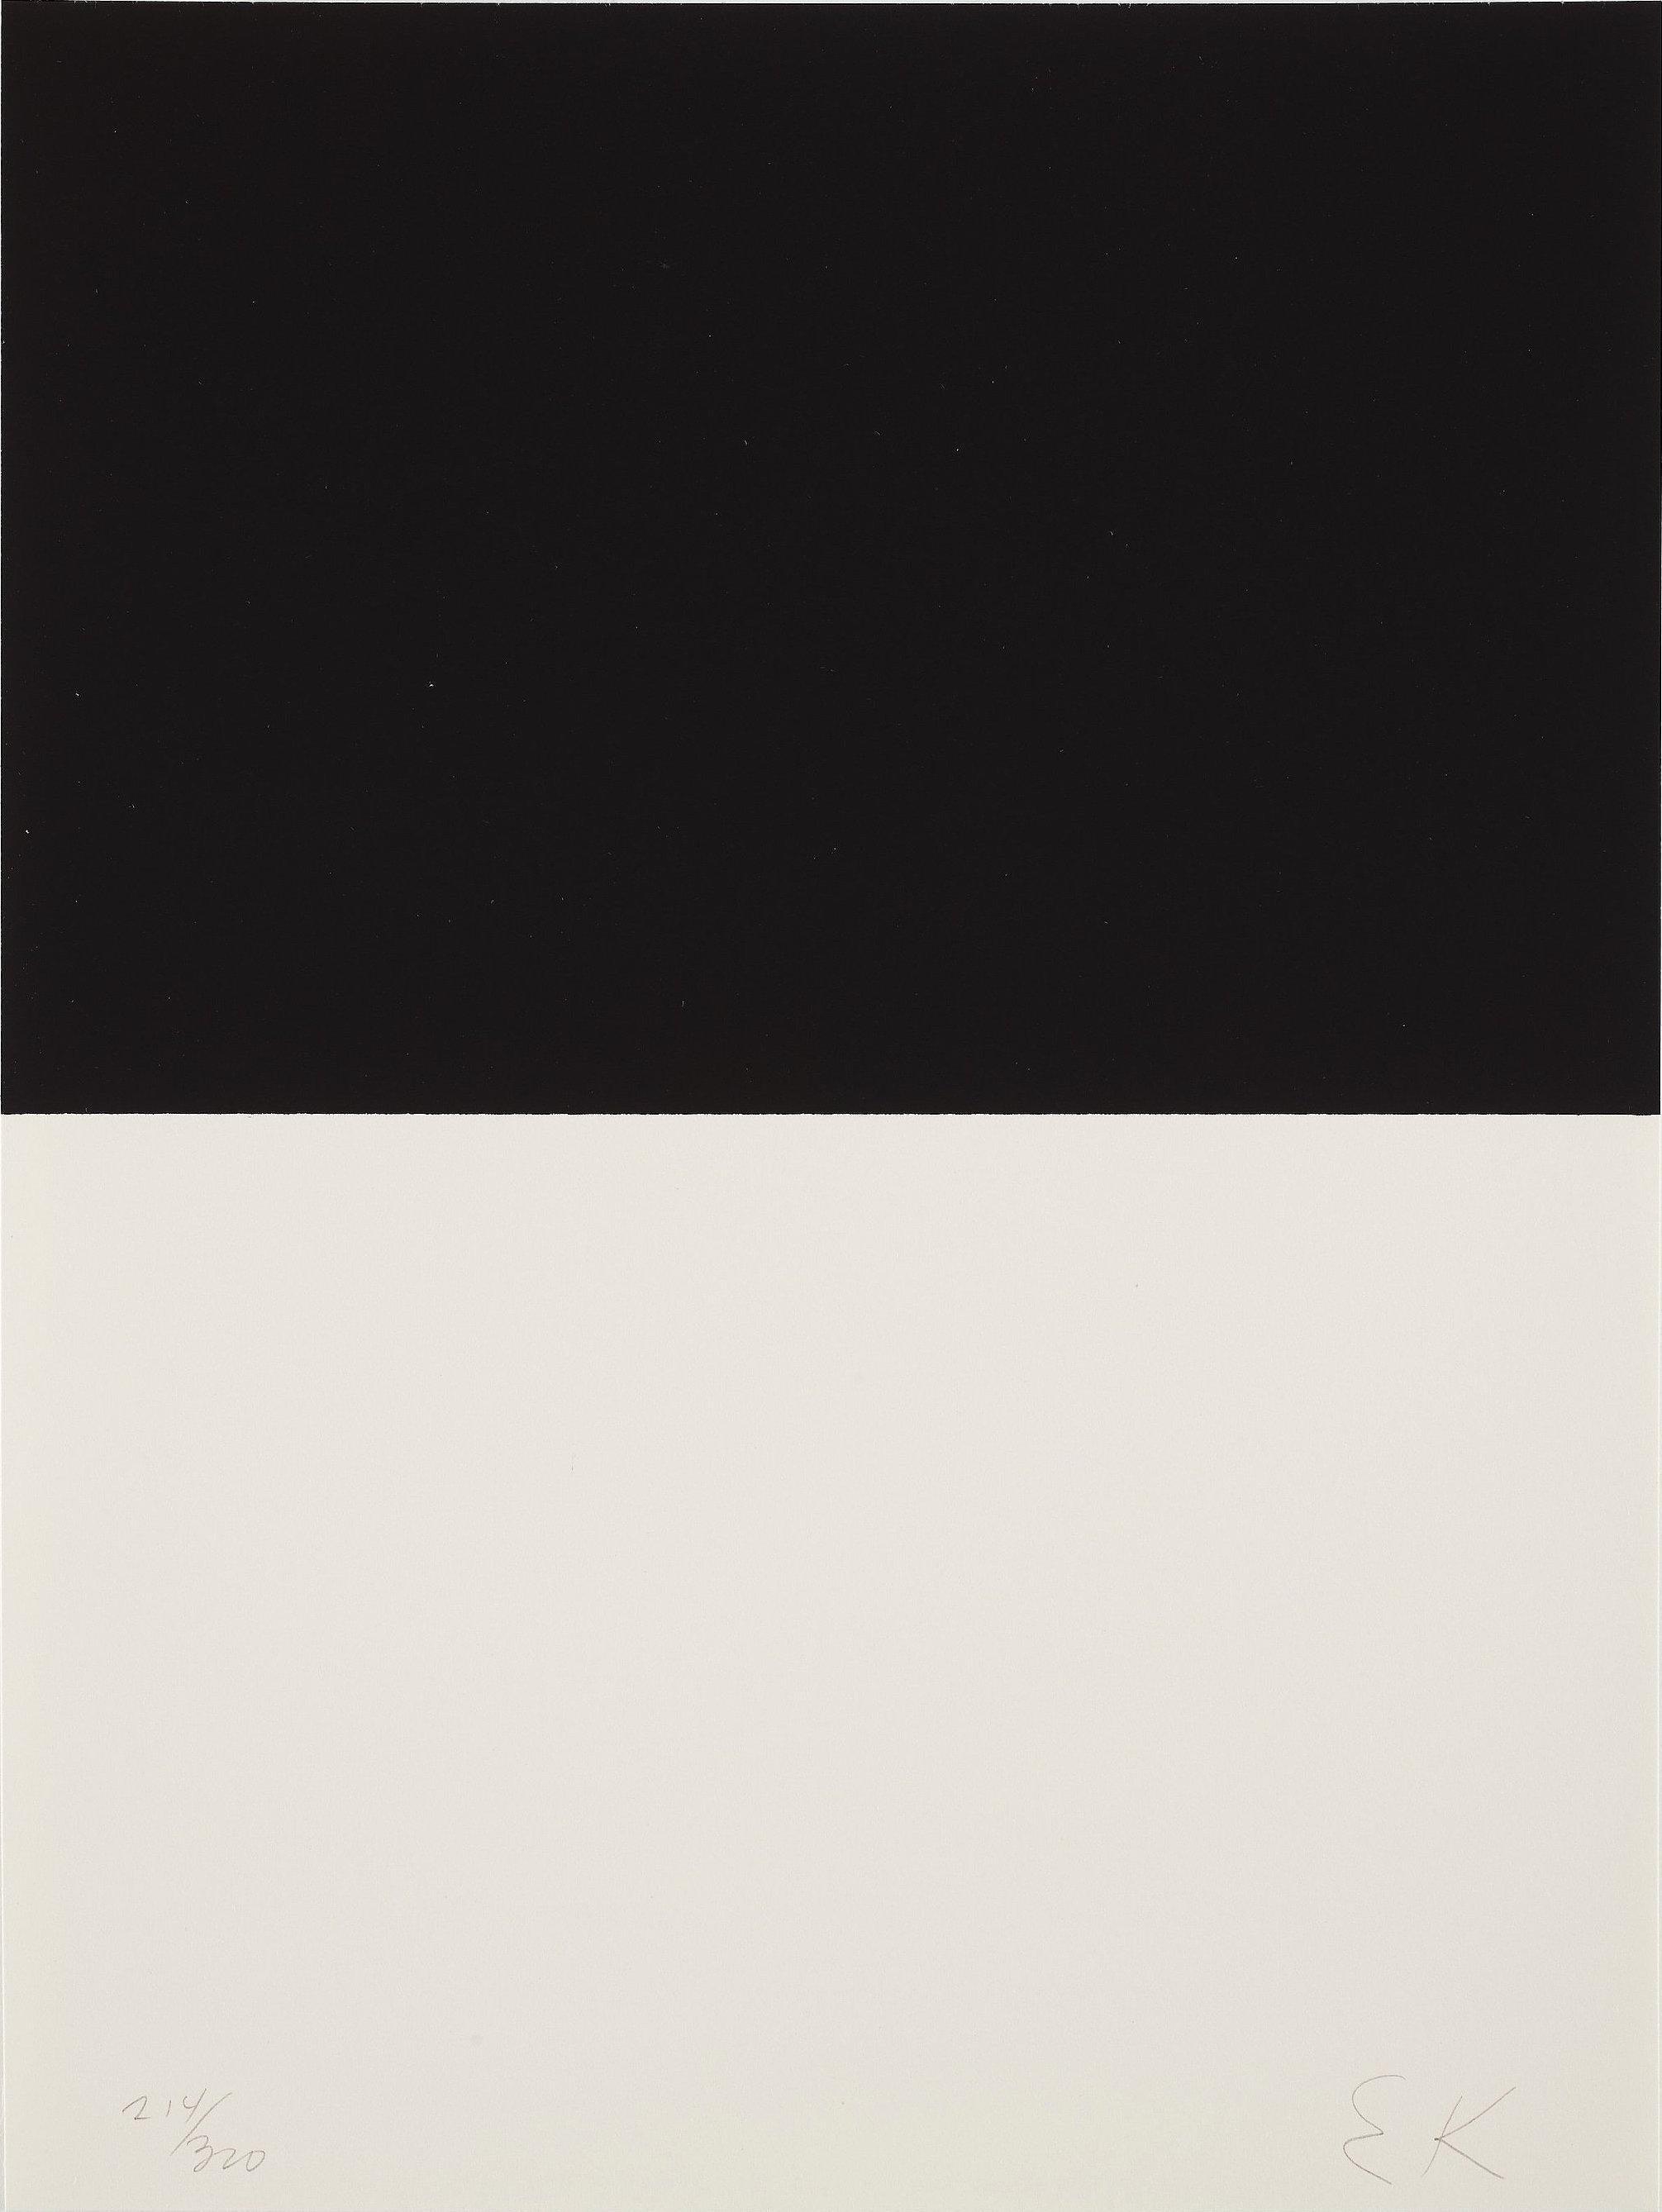 Untitled -- Screen Print, Minimalism, Geometric Abstraction by Ellsworth Kelly